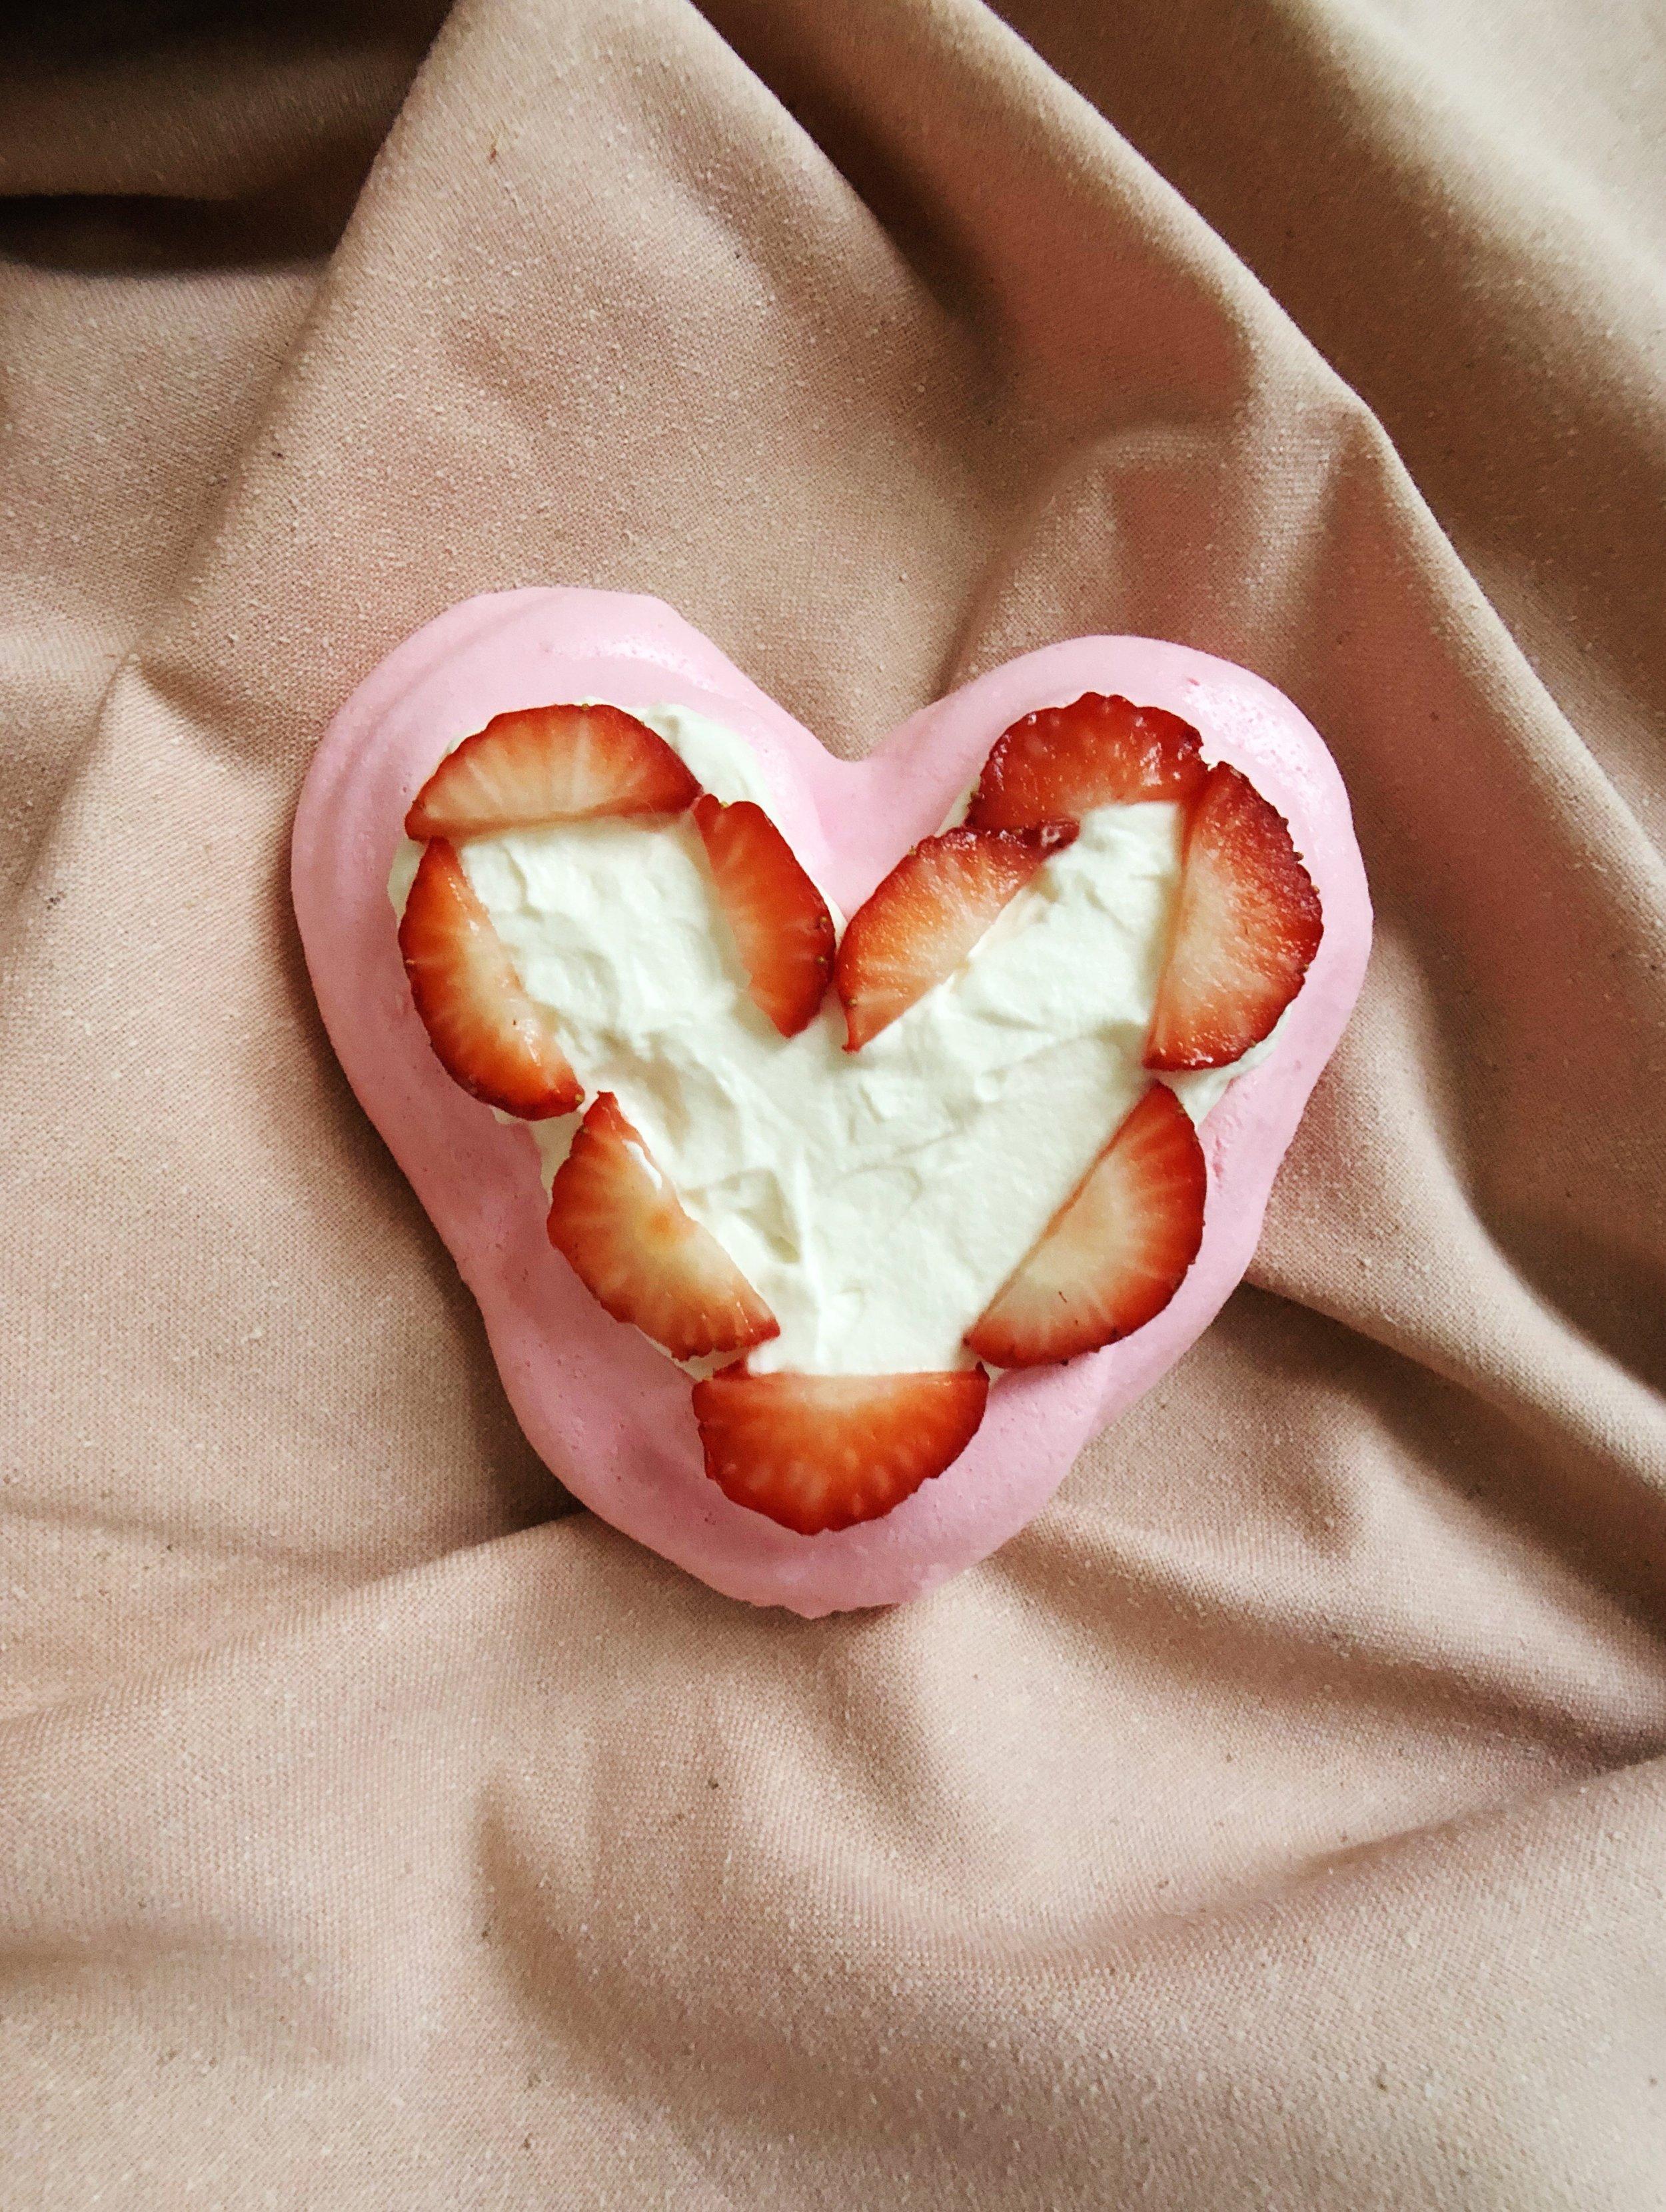 Heart-pavlova-dessert-valentine's-day-pink-baking-recipe-food